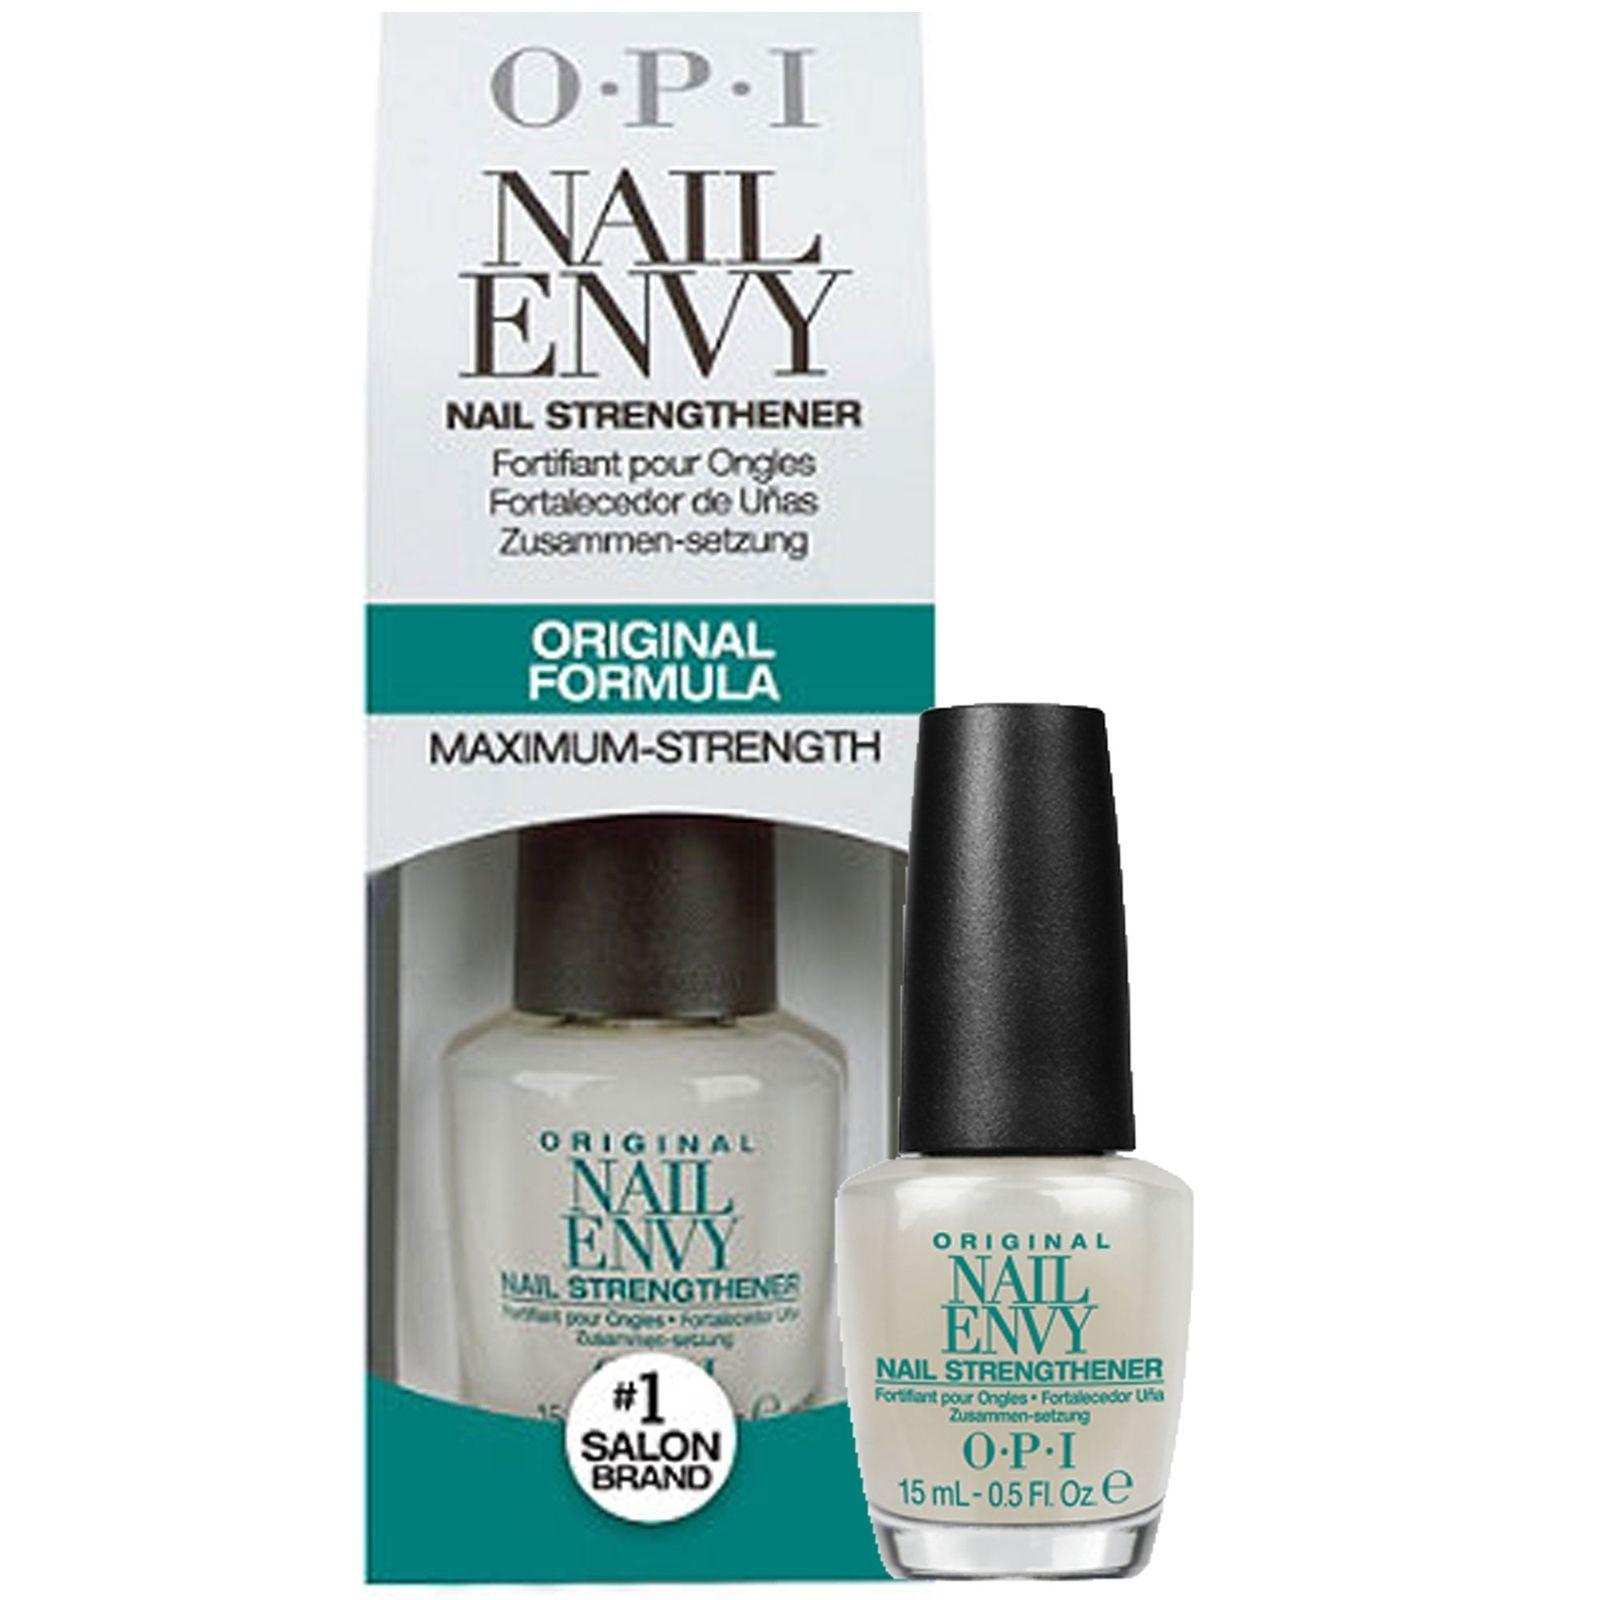 OPI Nail Envy Original Formula Nail Strengthener 0.5 oz | eBay